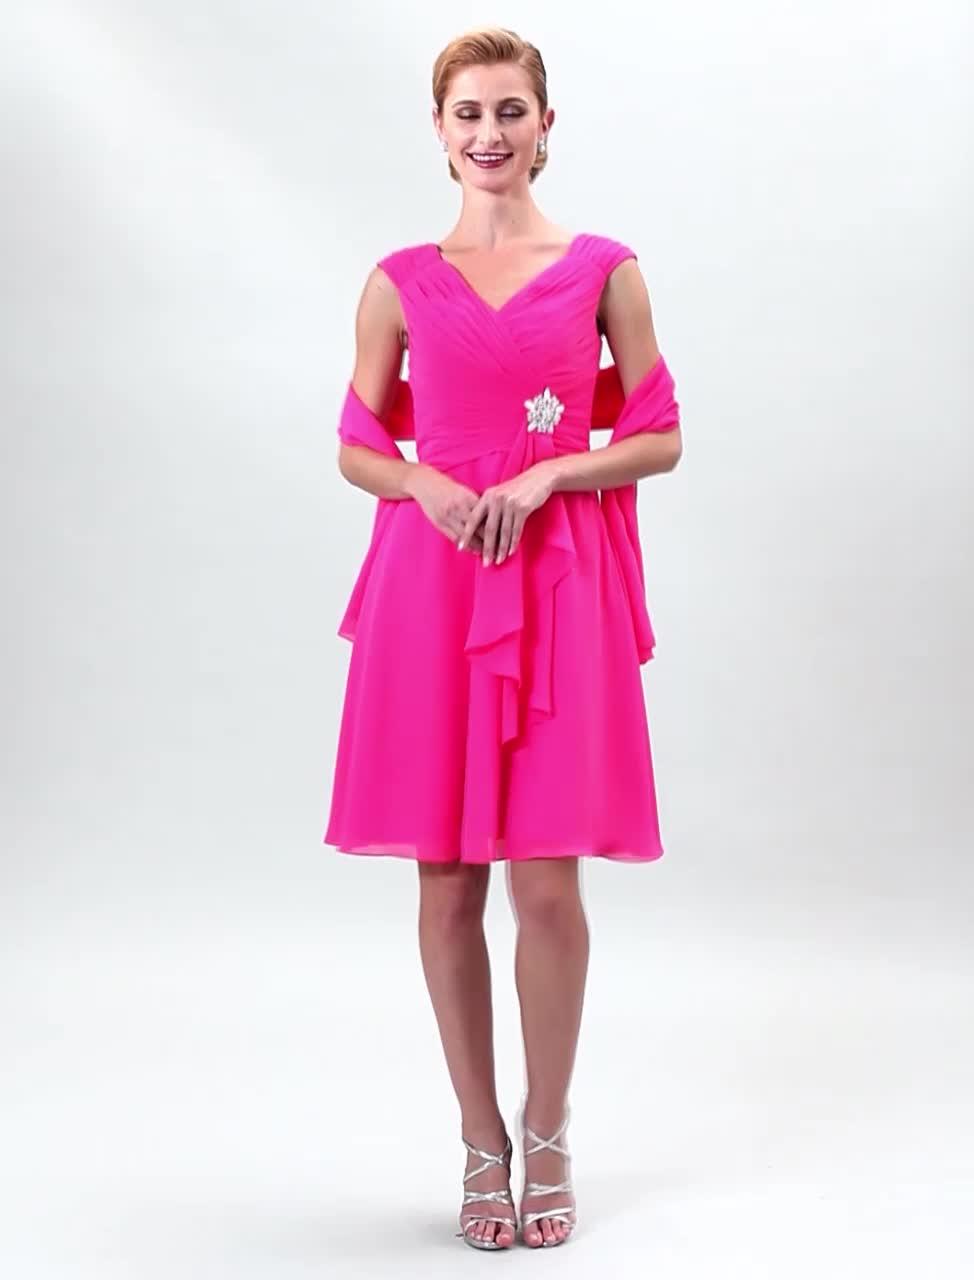 Asombroso Broches Para Vestidos De Dama Embellecimiento - Colección ...